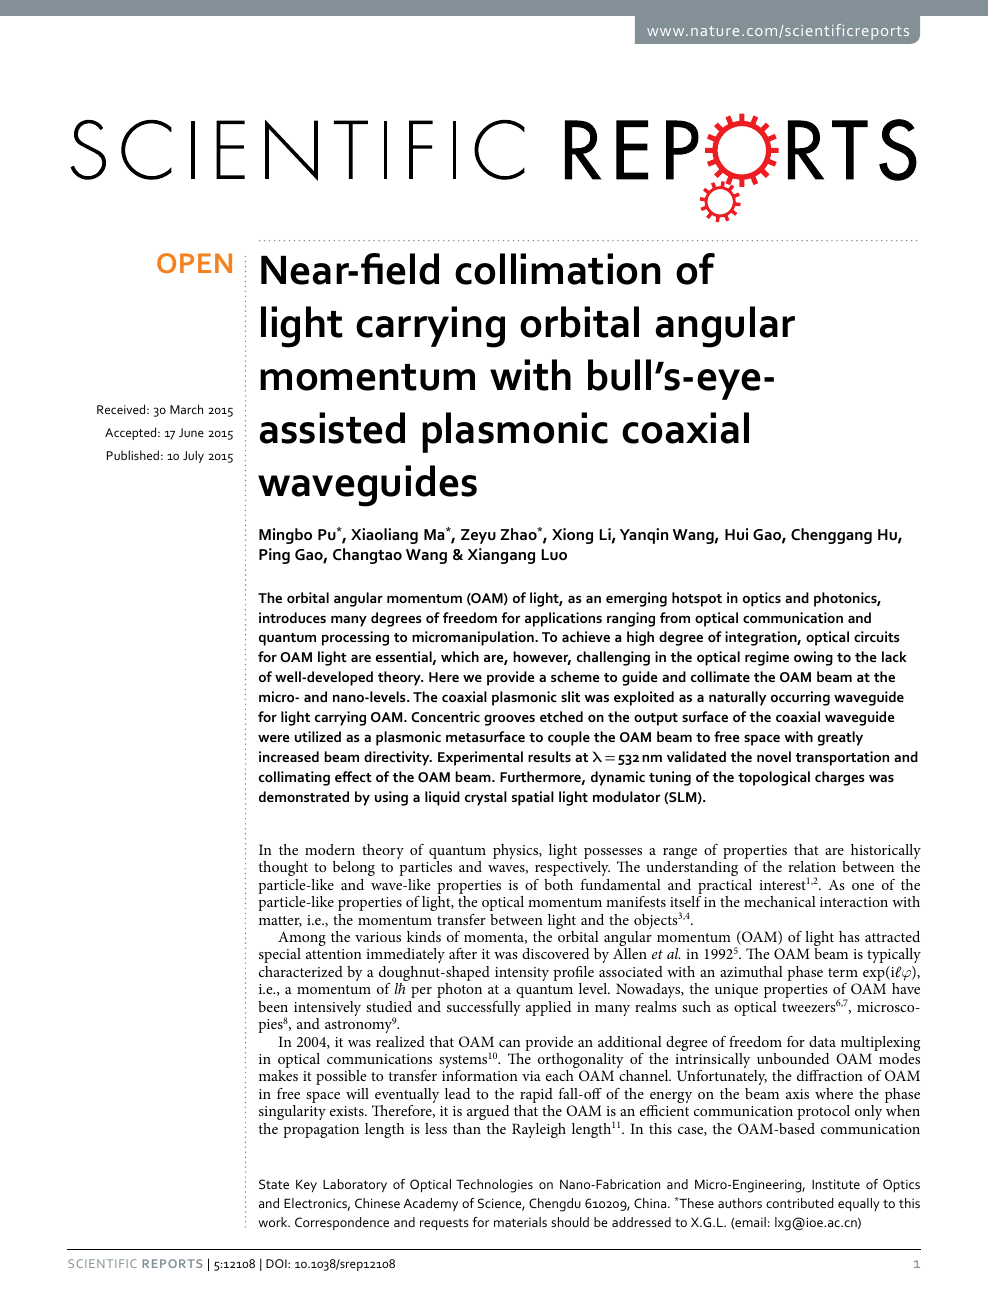 Near-field collimation of light carrying orbital angular